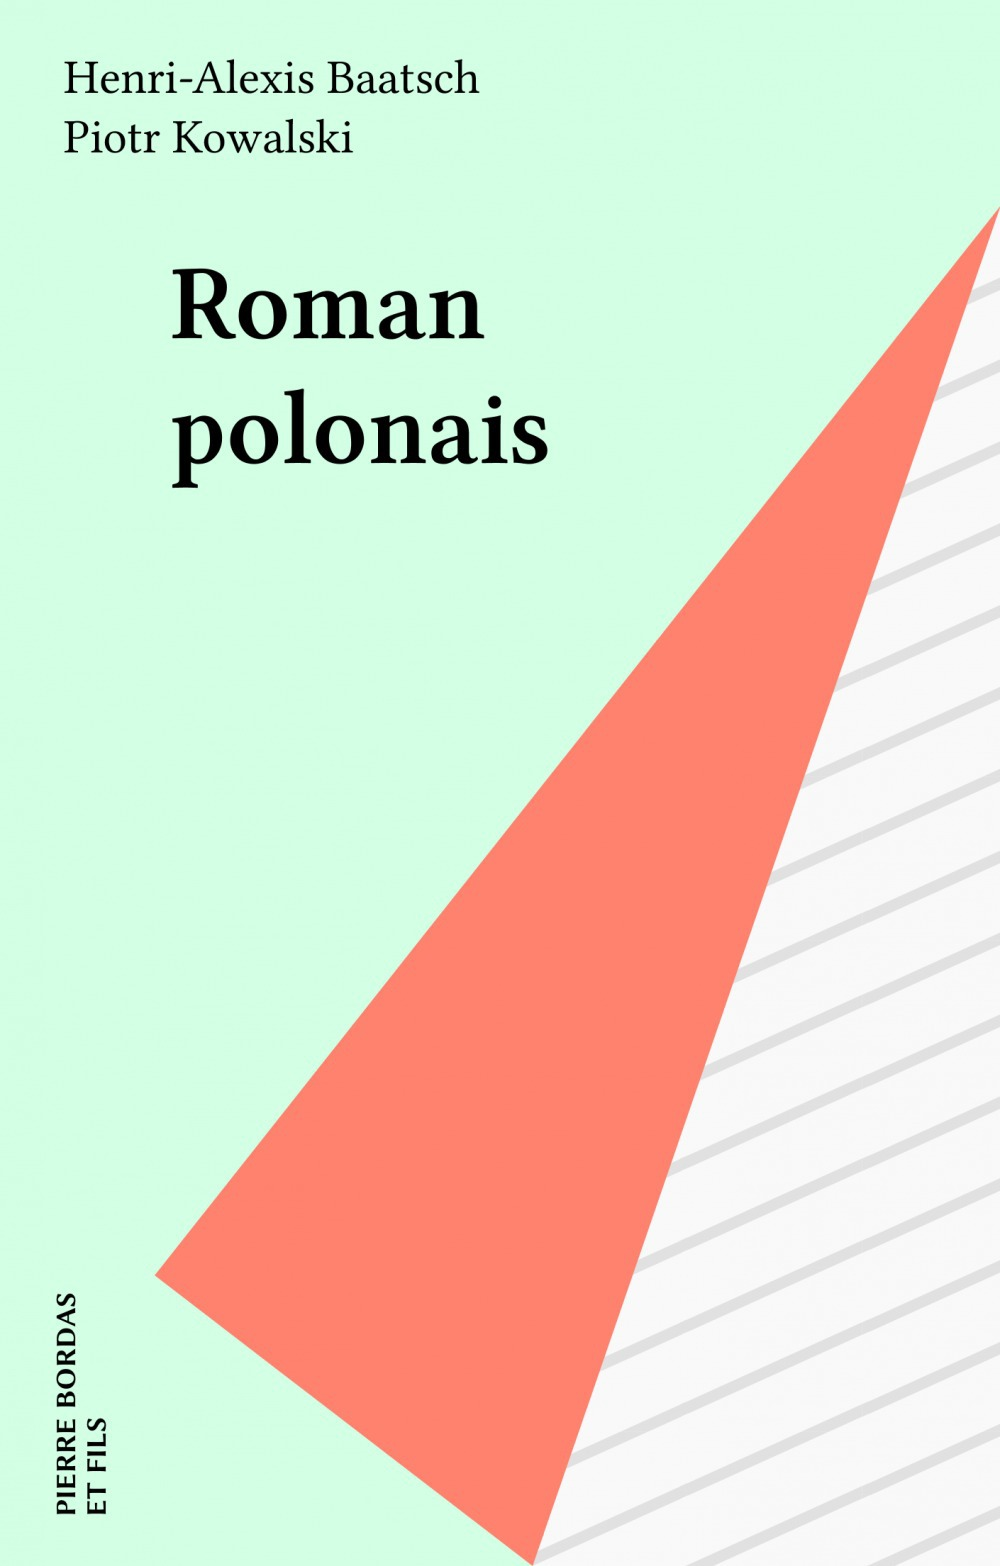 Roman polonais  - Piotr Kowalski  - Henri-Alexis Baatsch